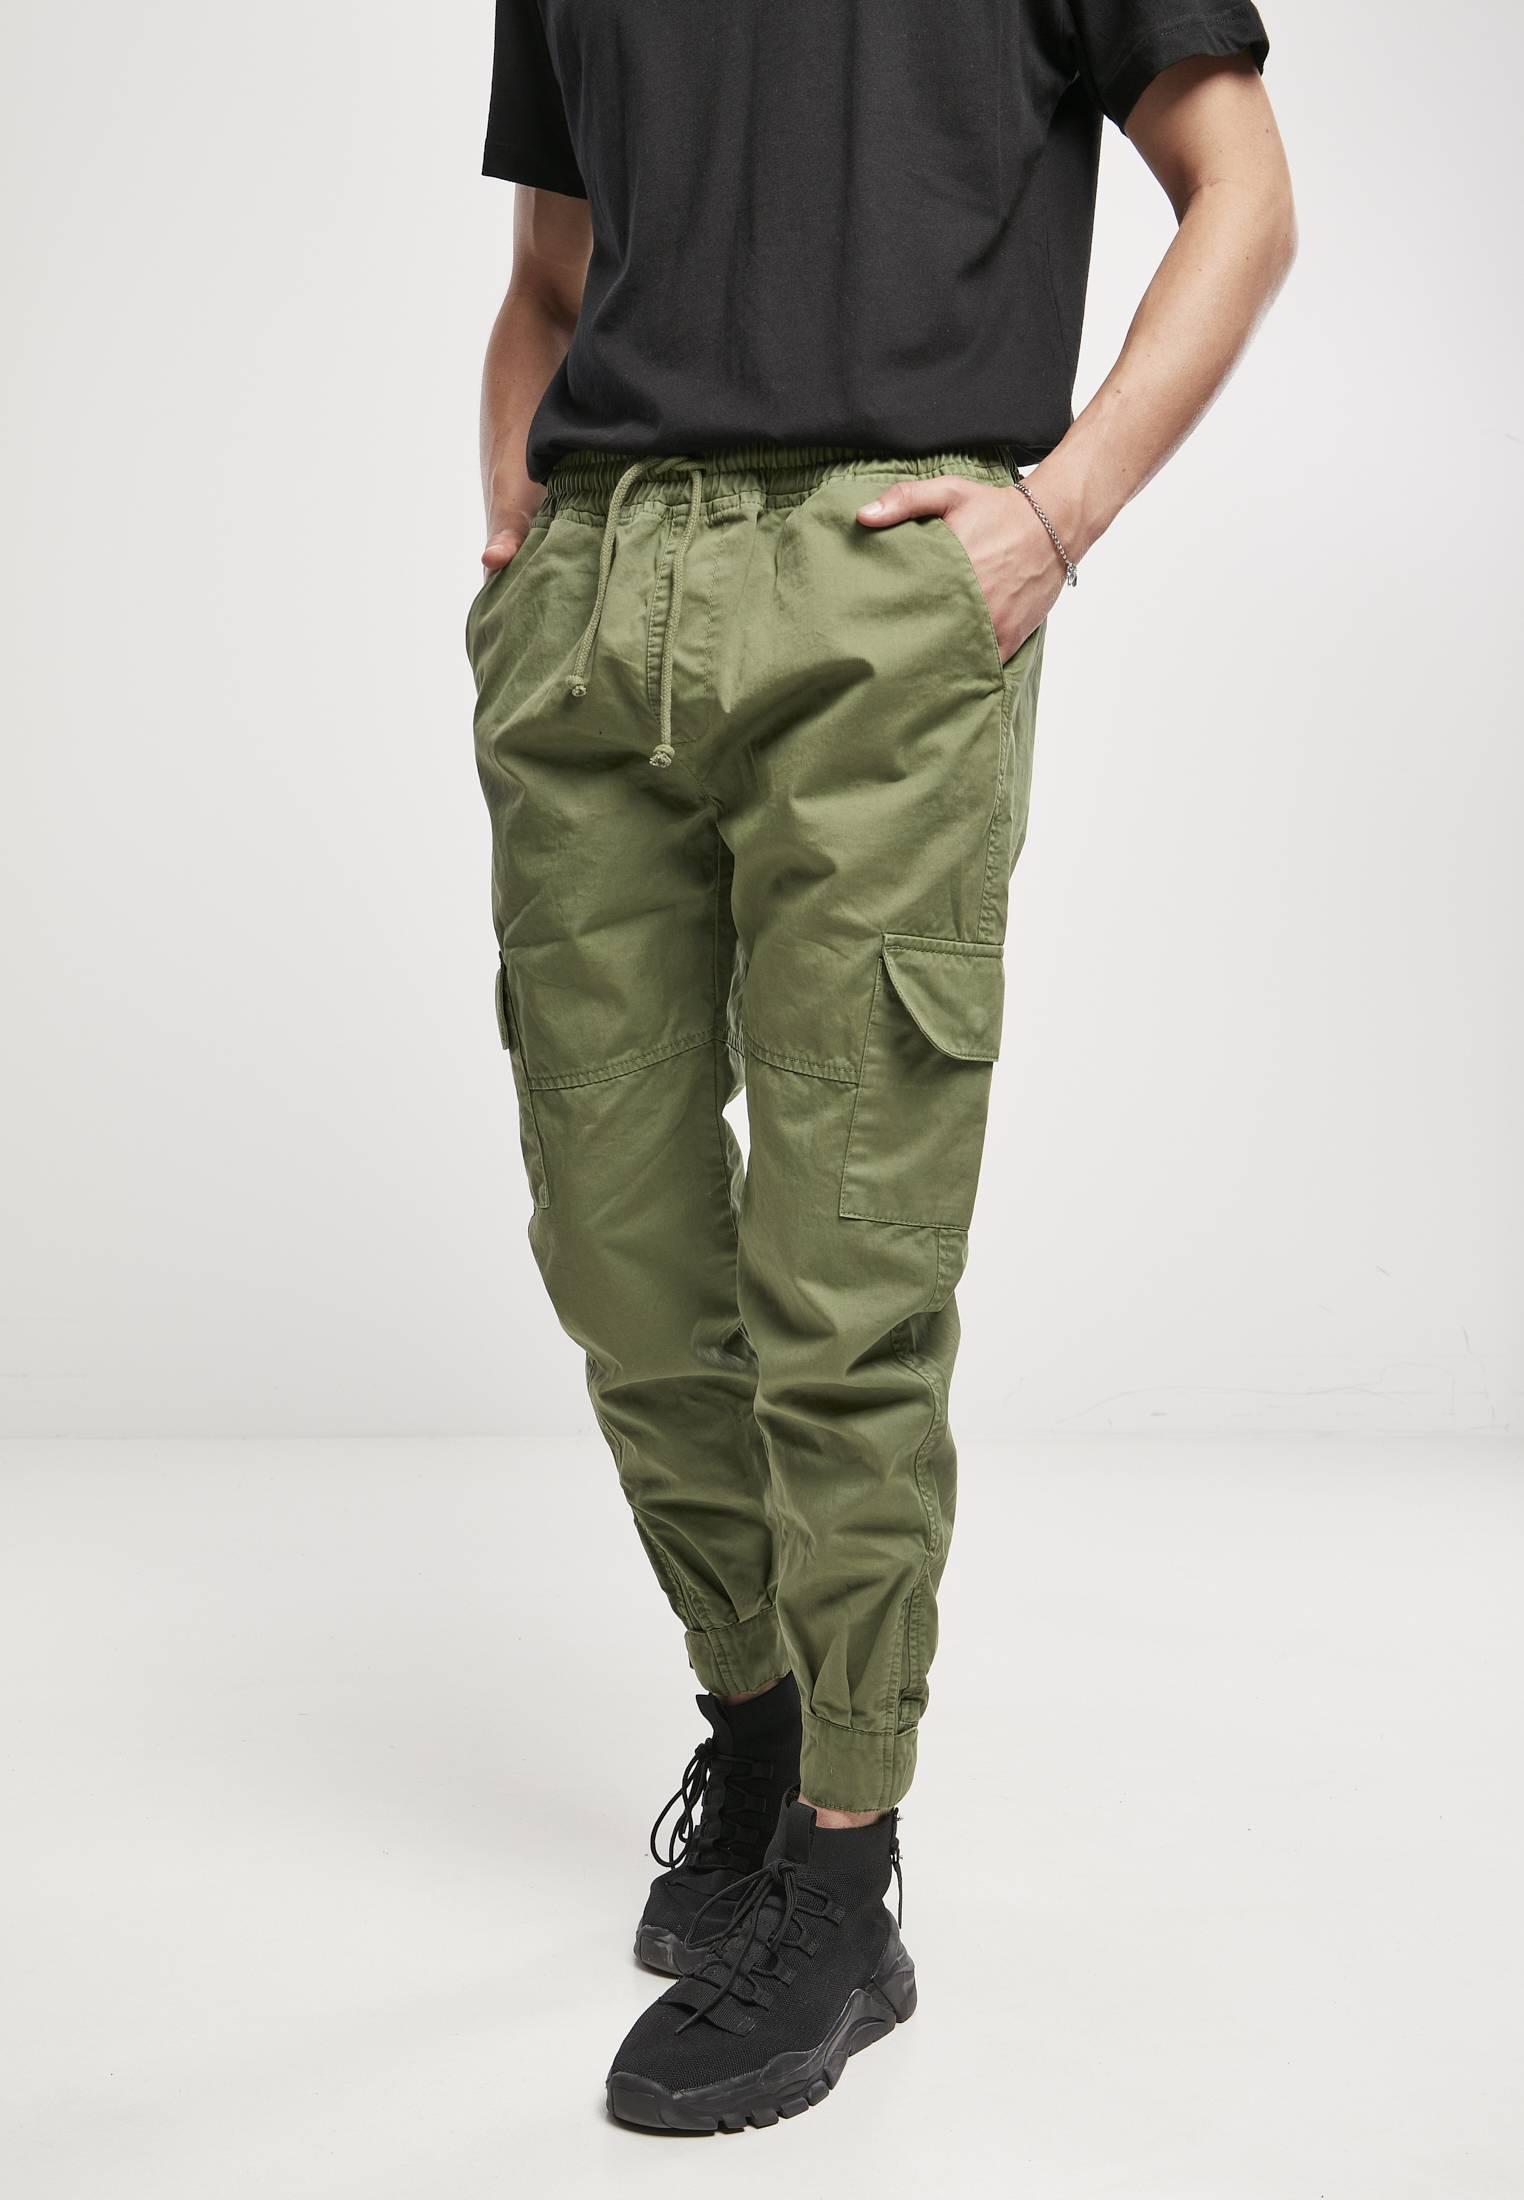 Urban Classics Military Jogg Pants newolive - S